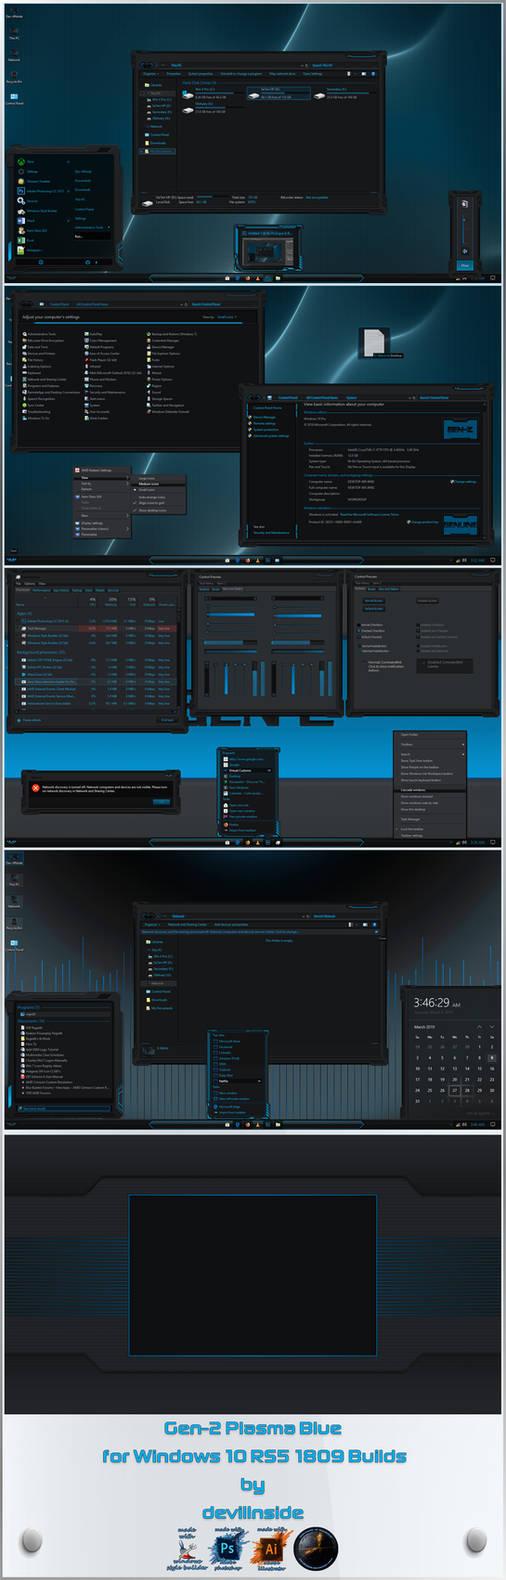 Gen-2: Plasma Blue Windows 10 Edition by devillnside